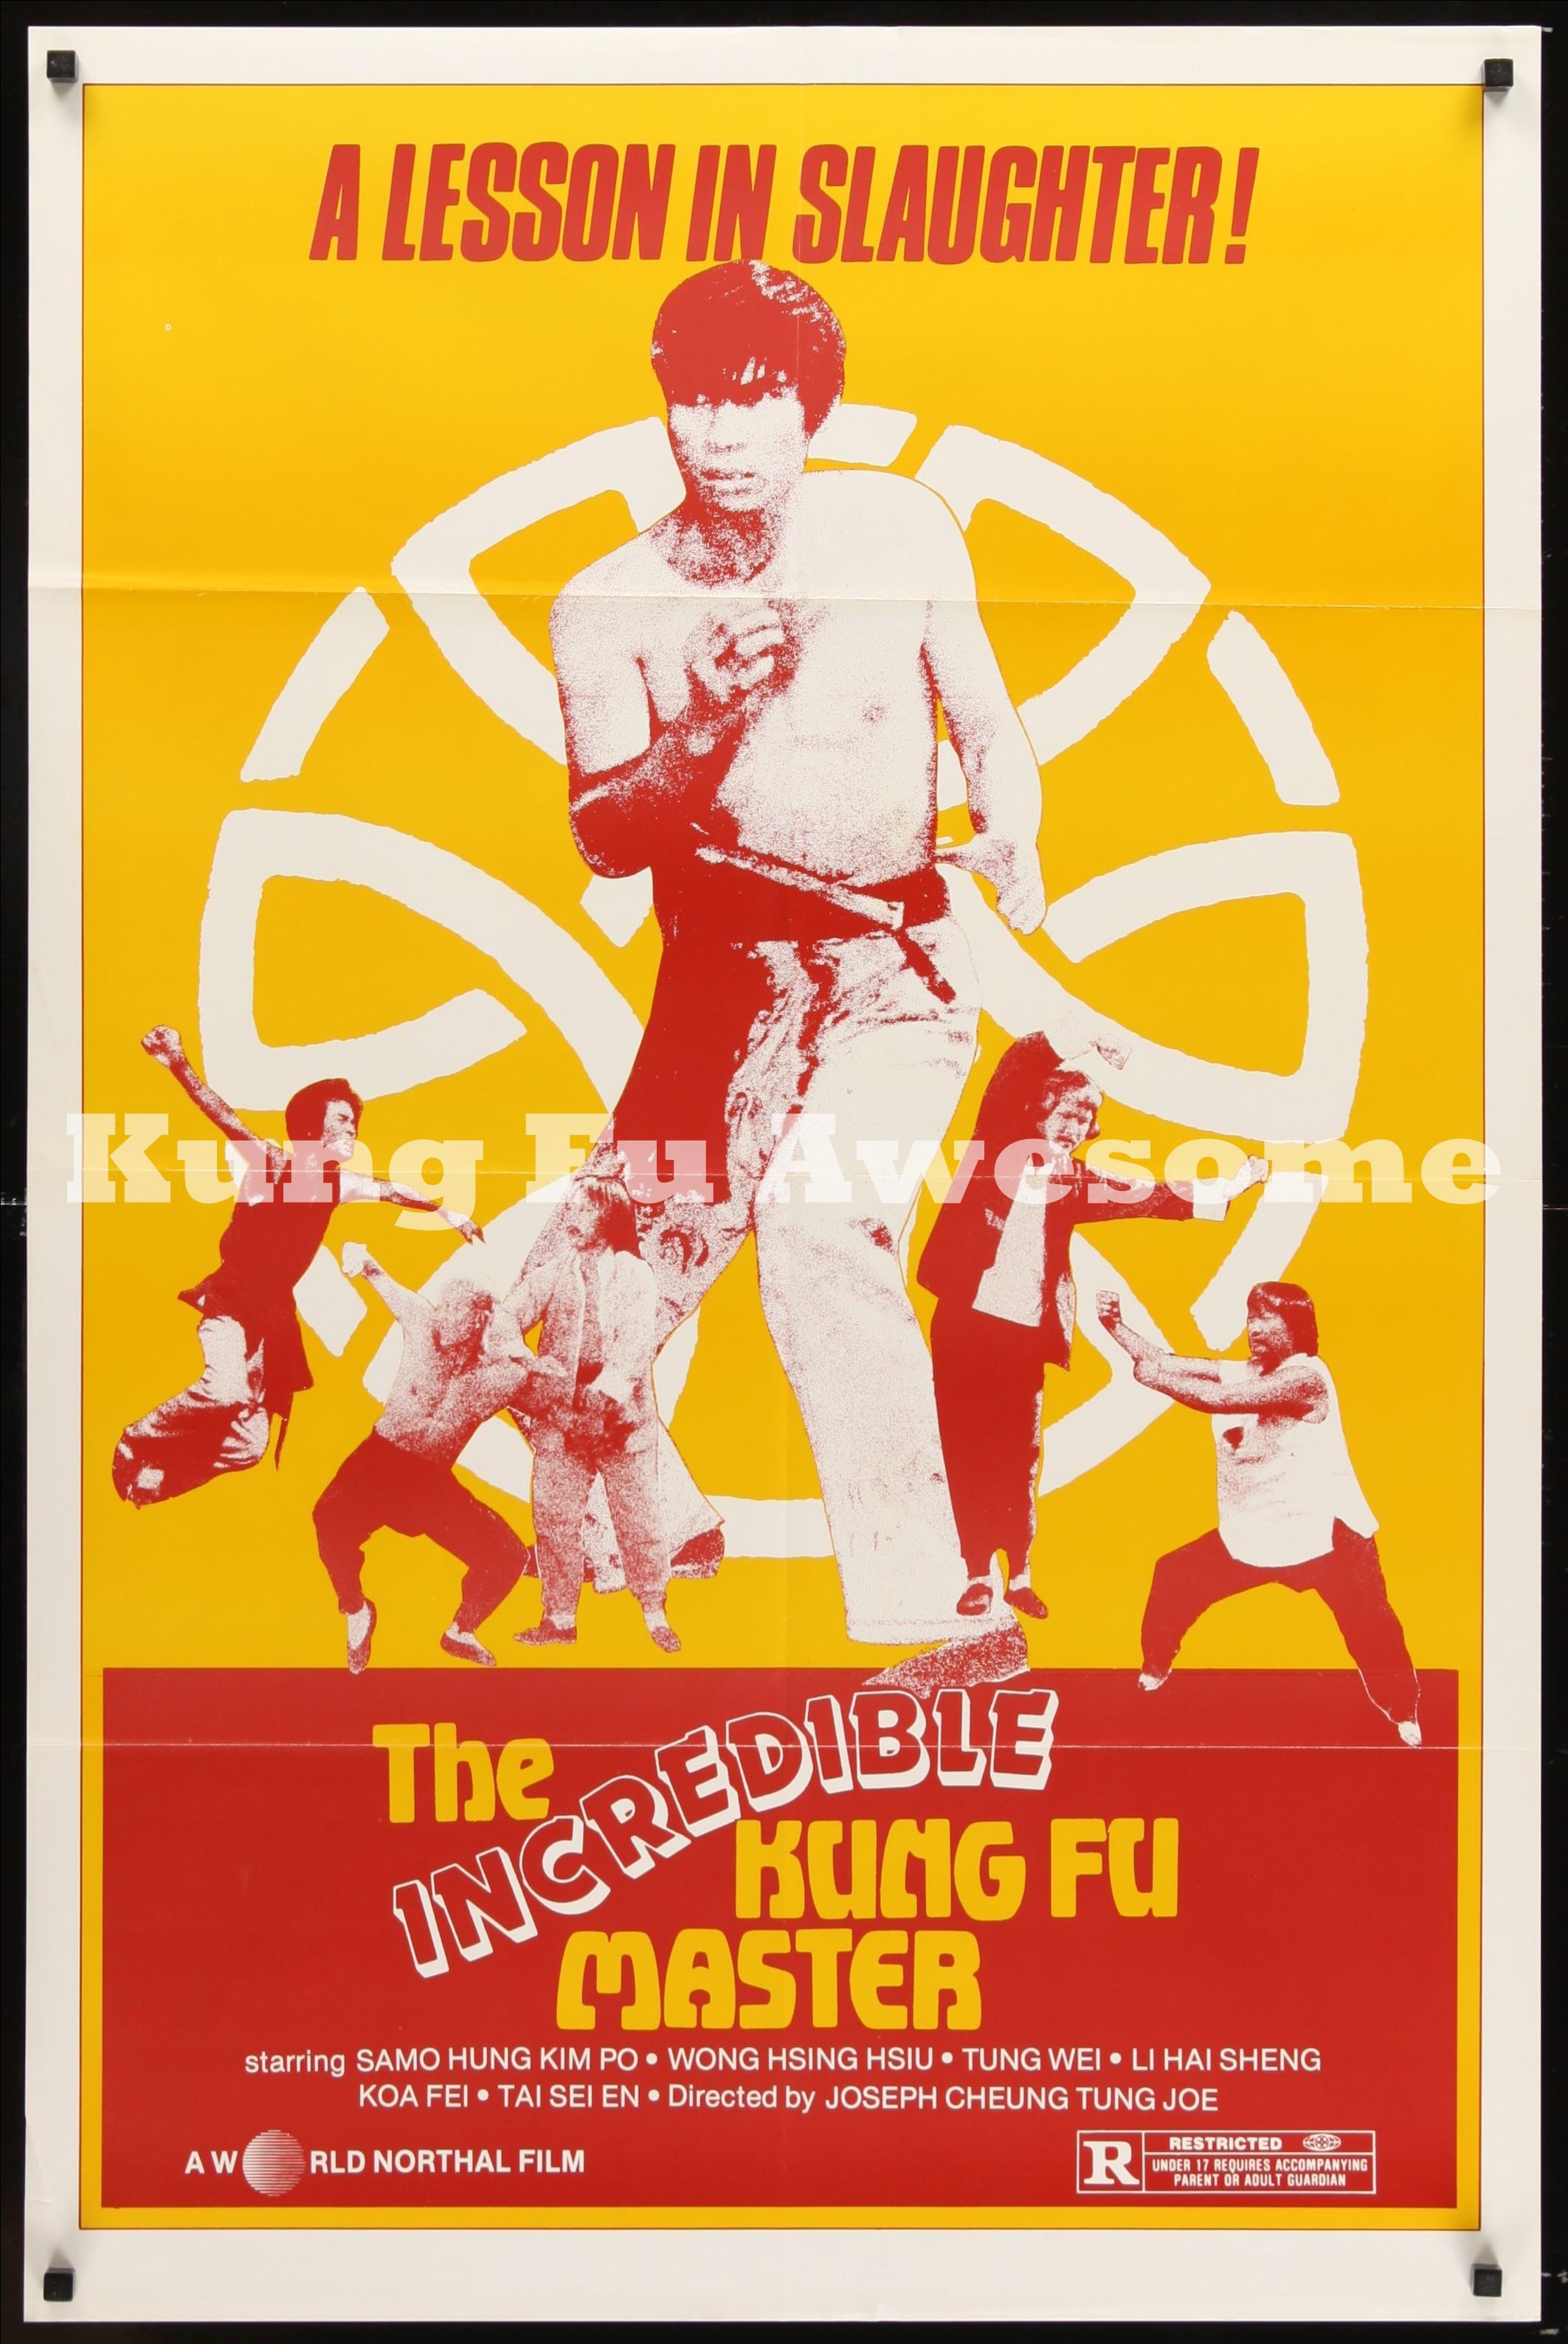 incredible_kung_fu_master_NZ03443_L.jpg